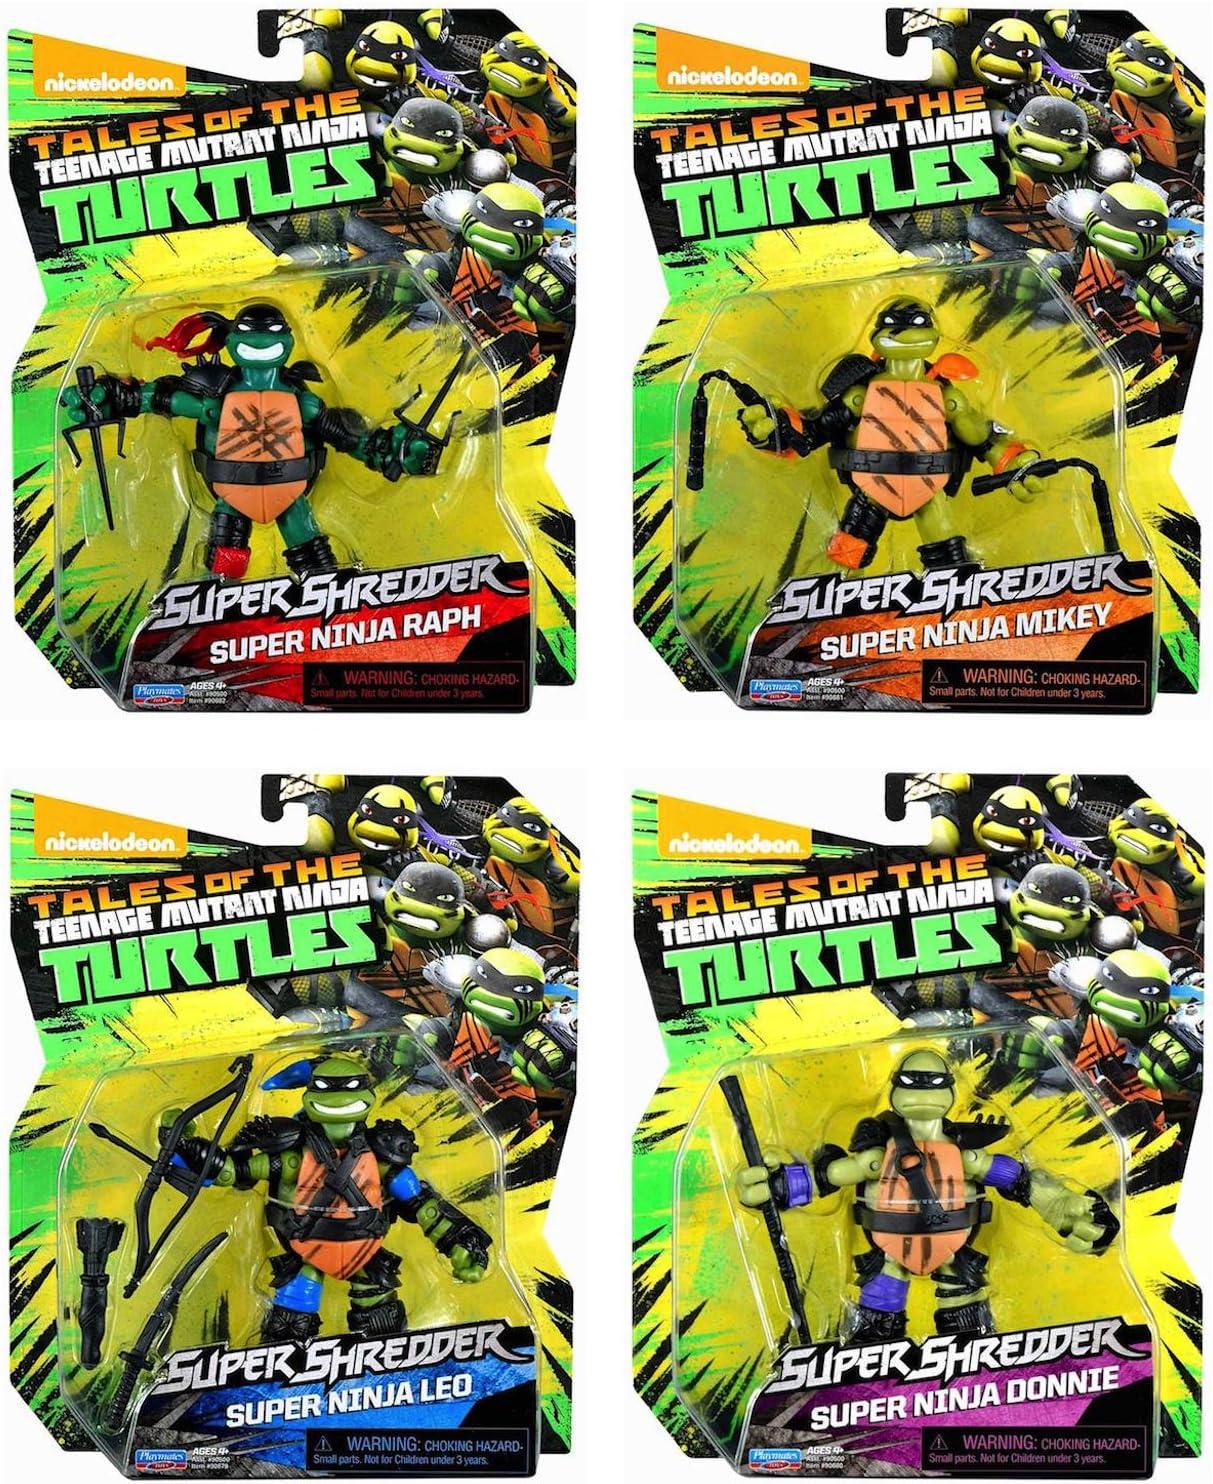 Amazon.com: teenage mutant ninja turtles Juego de 4 super ...